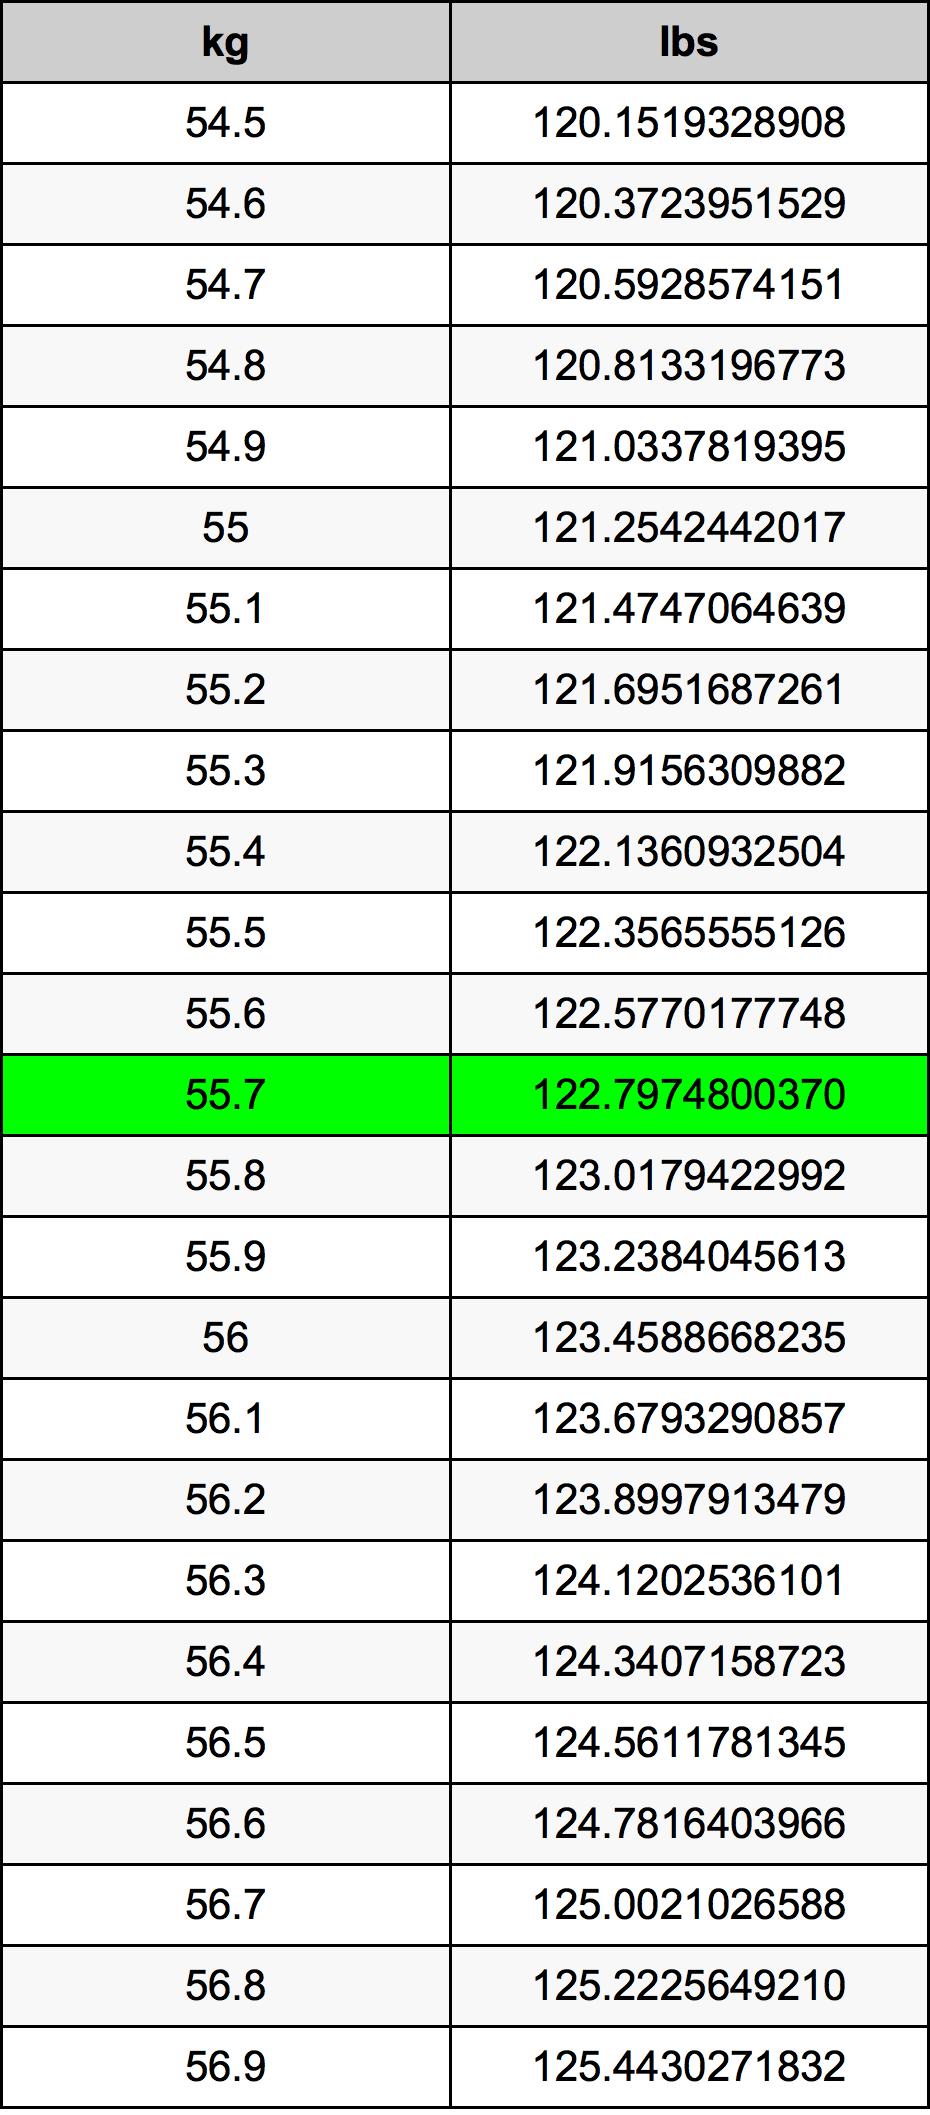 55.7 Kilogramme Table